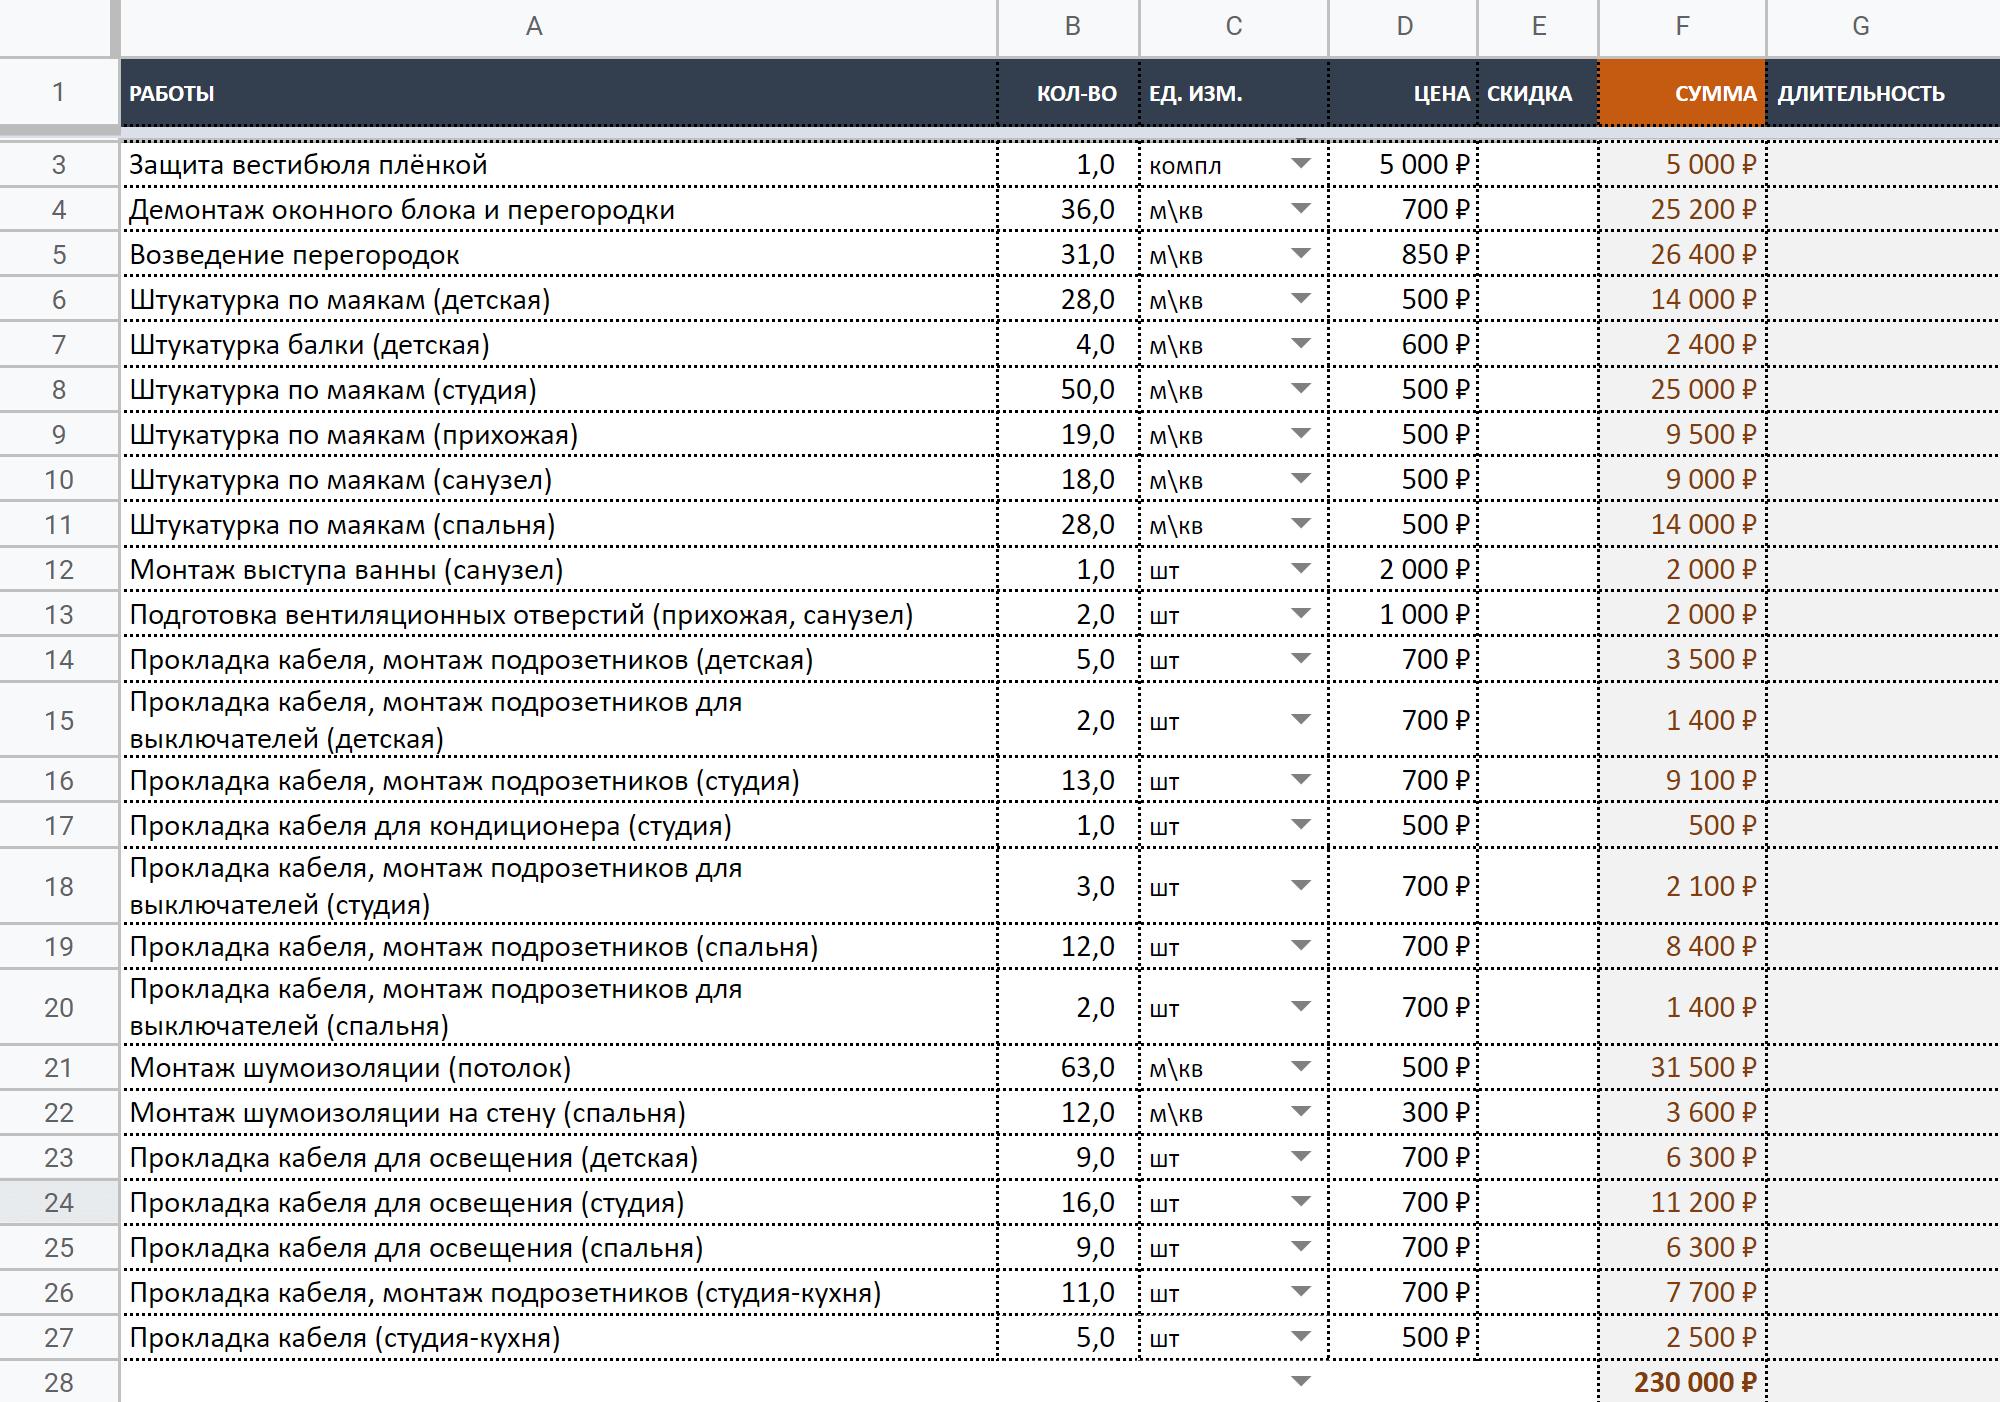 Exemplo de estimativa simples nas tabelas do Google